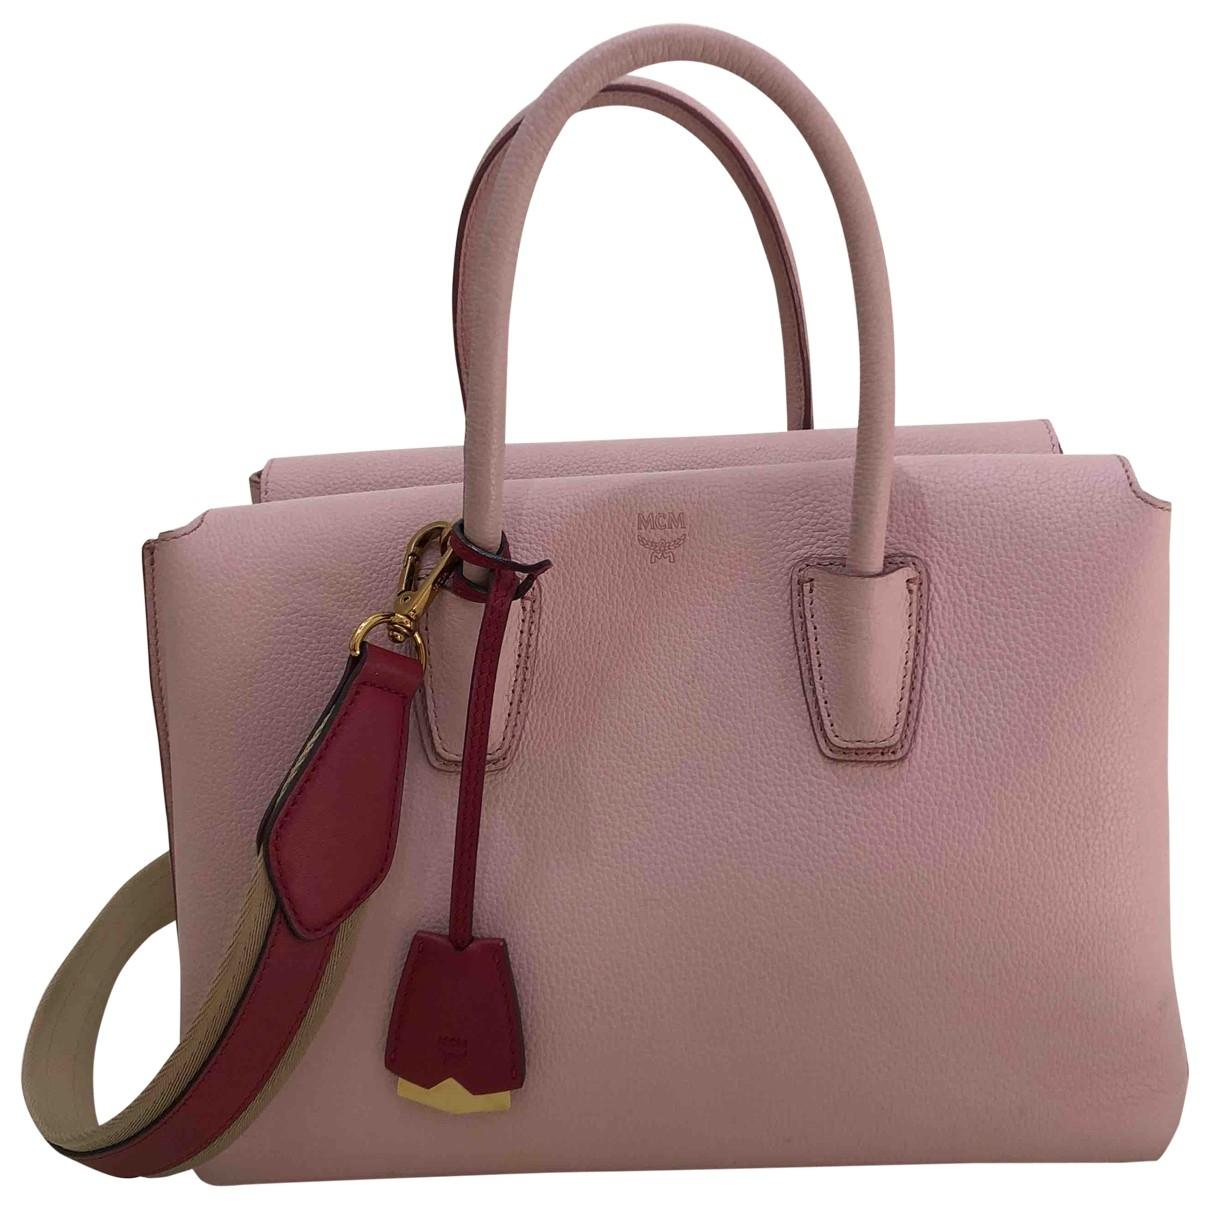 Mcm Milla Pink Leather handbag for Women \N